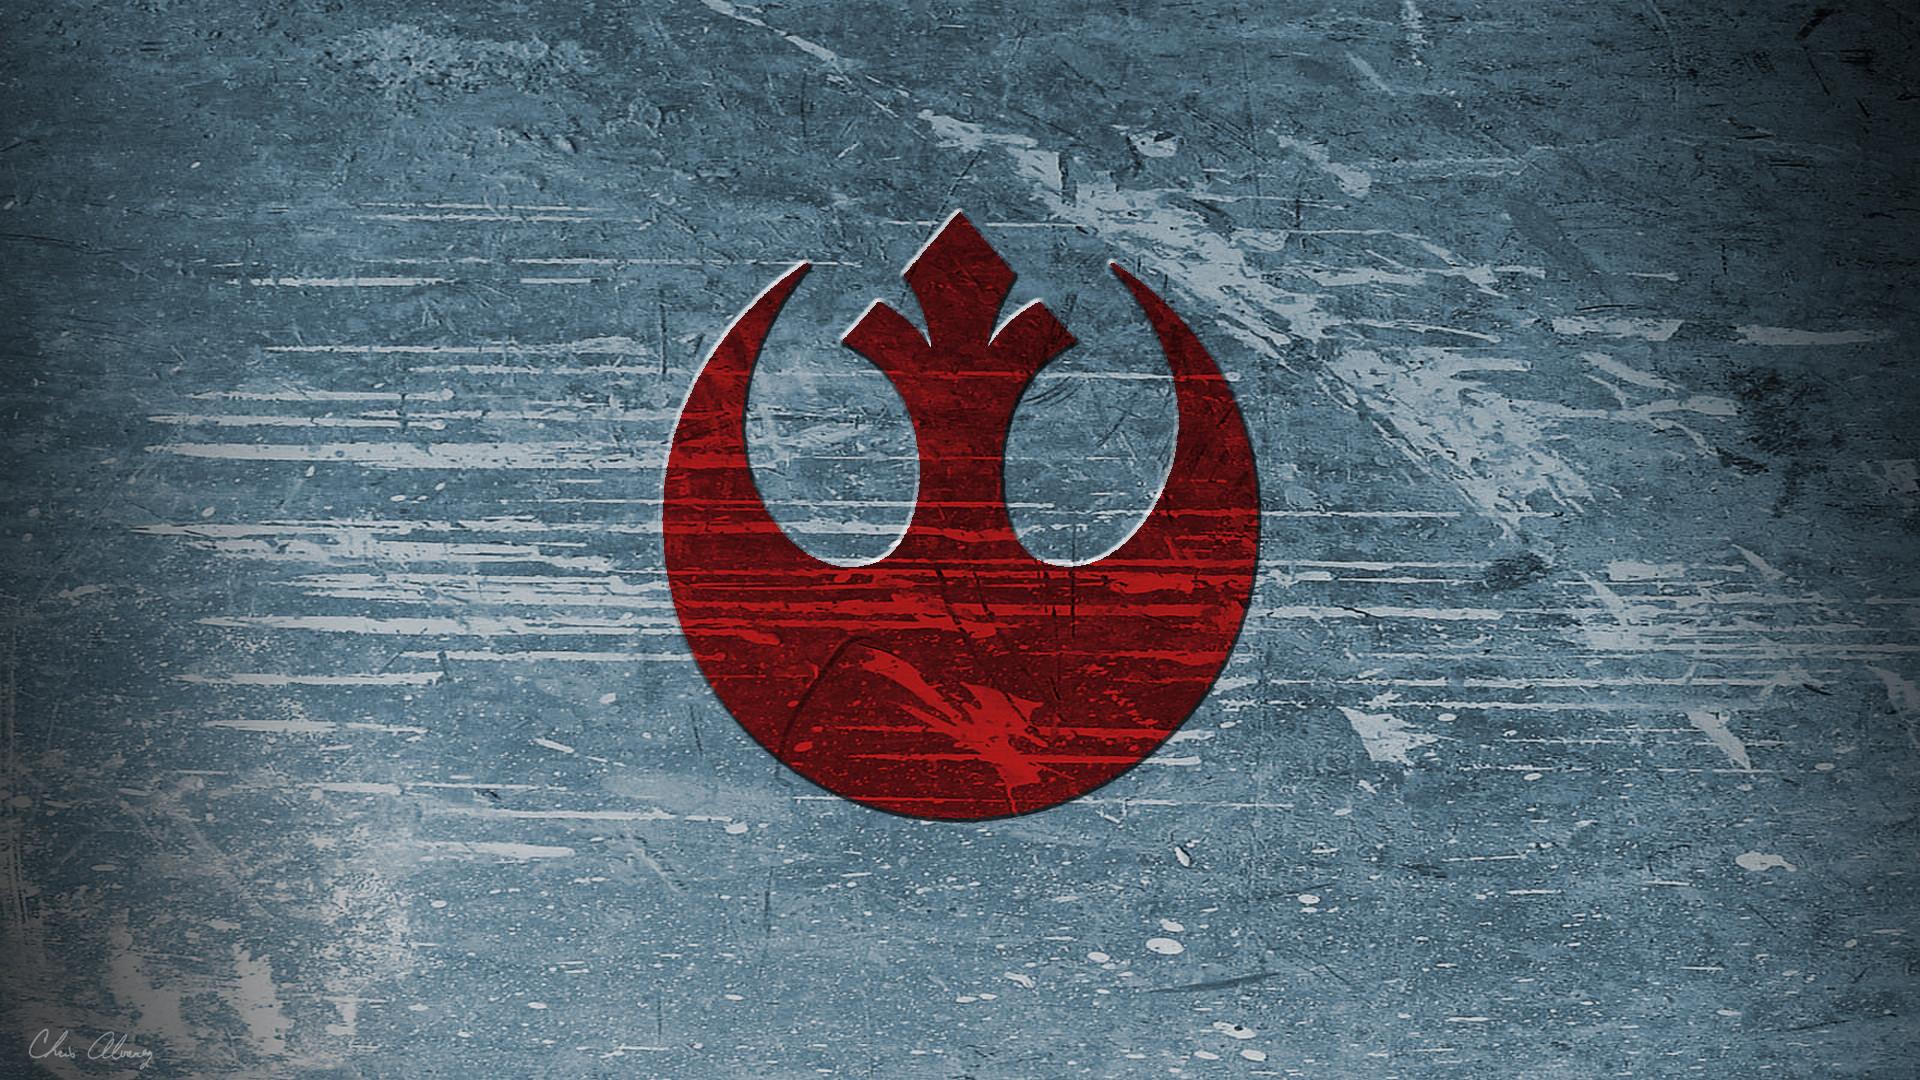 Star Wars Rebels Hd Wallpapers 84 Images